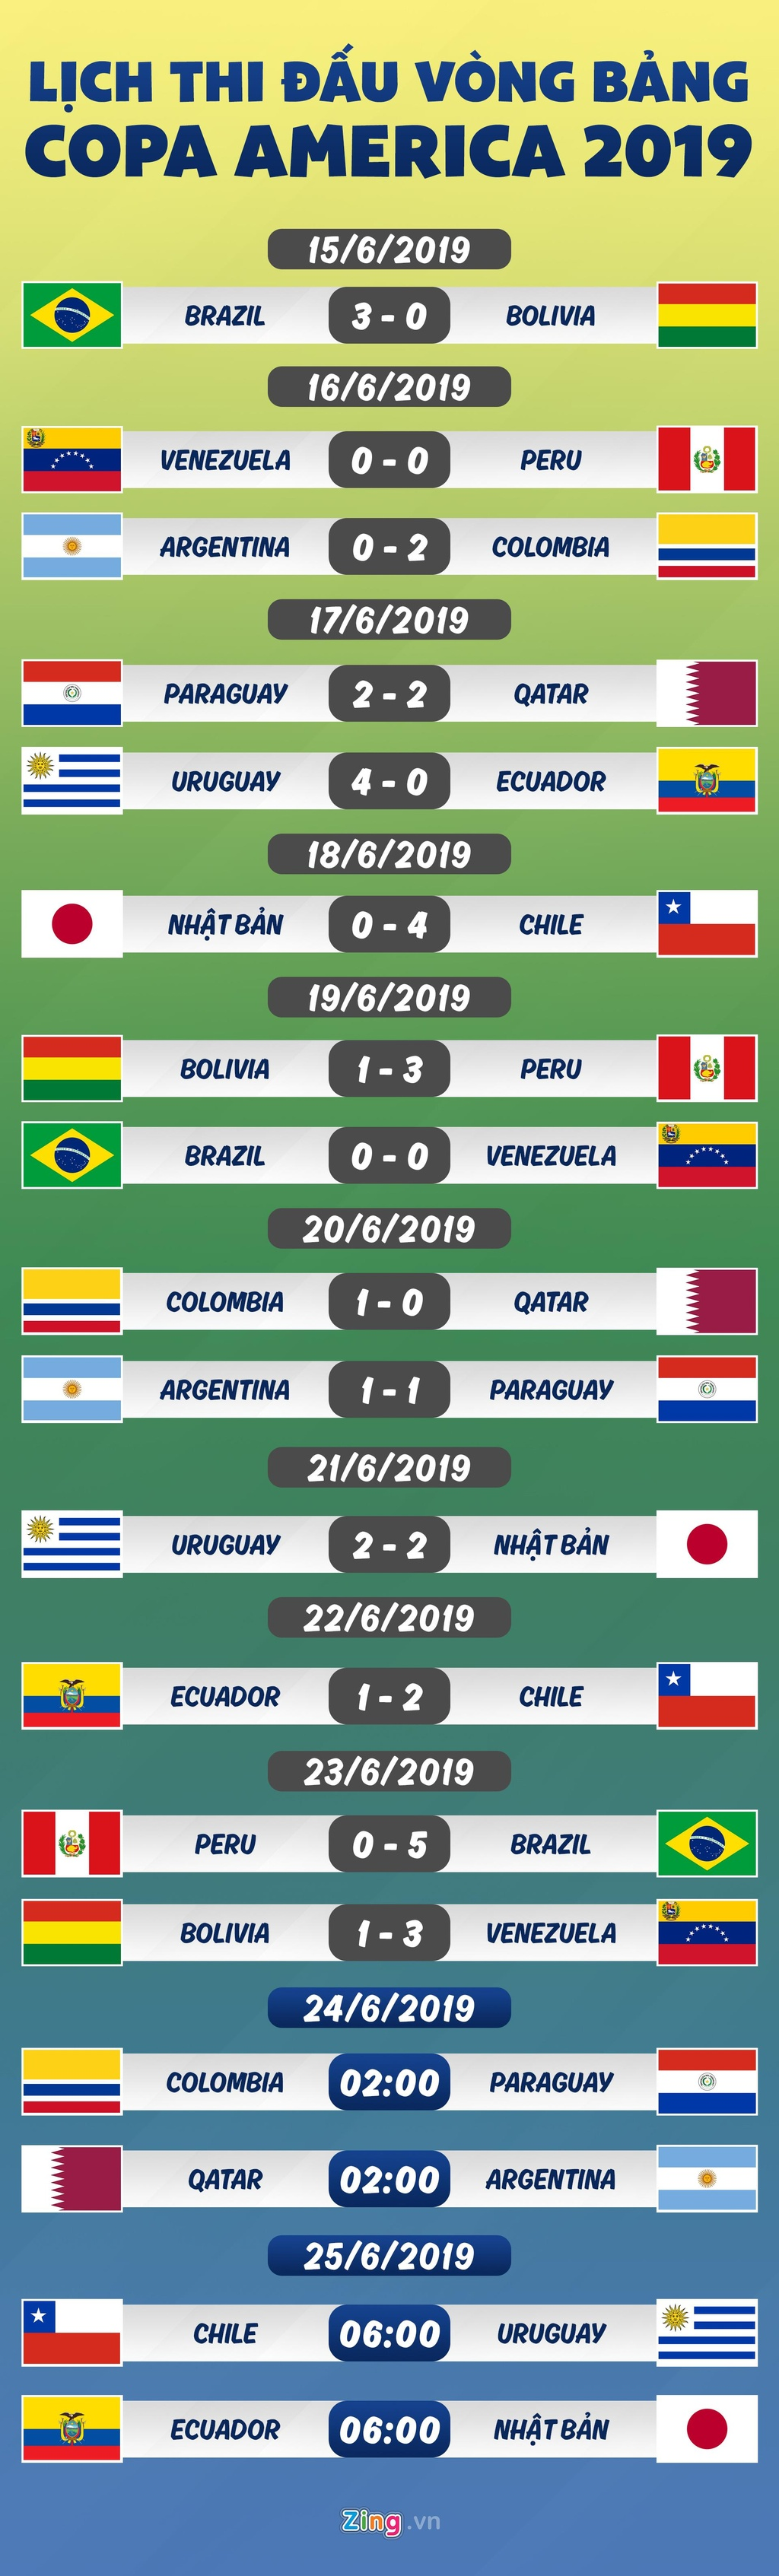 Lich thi dau Copa America: Argentina buoc phai thang Qatar hinh anh 1